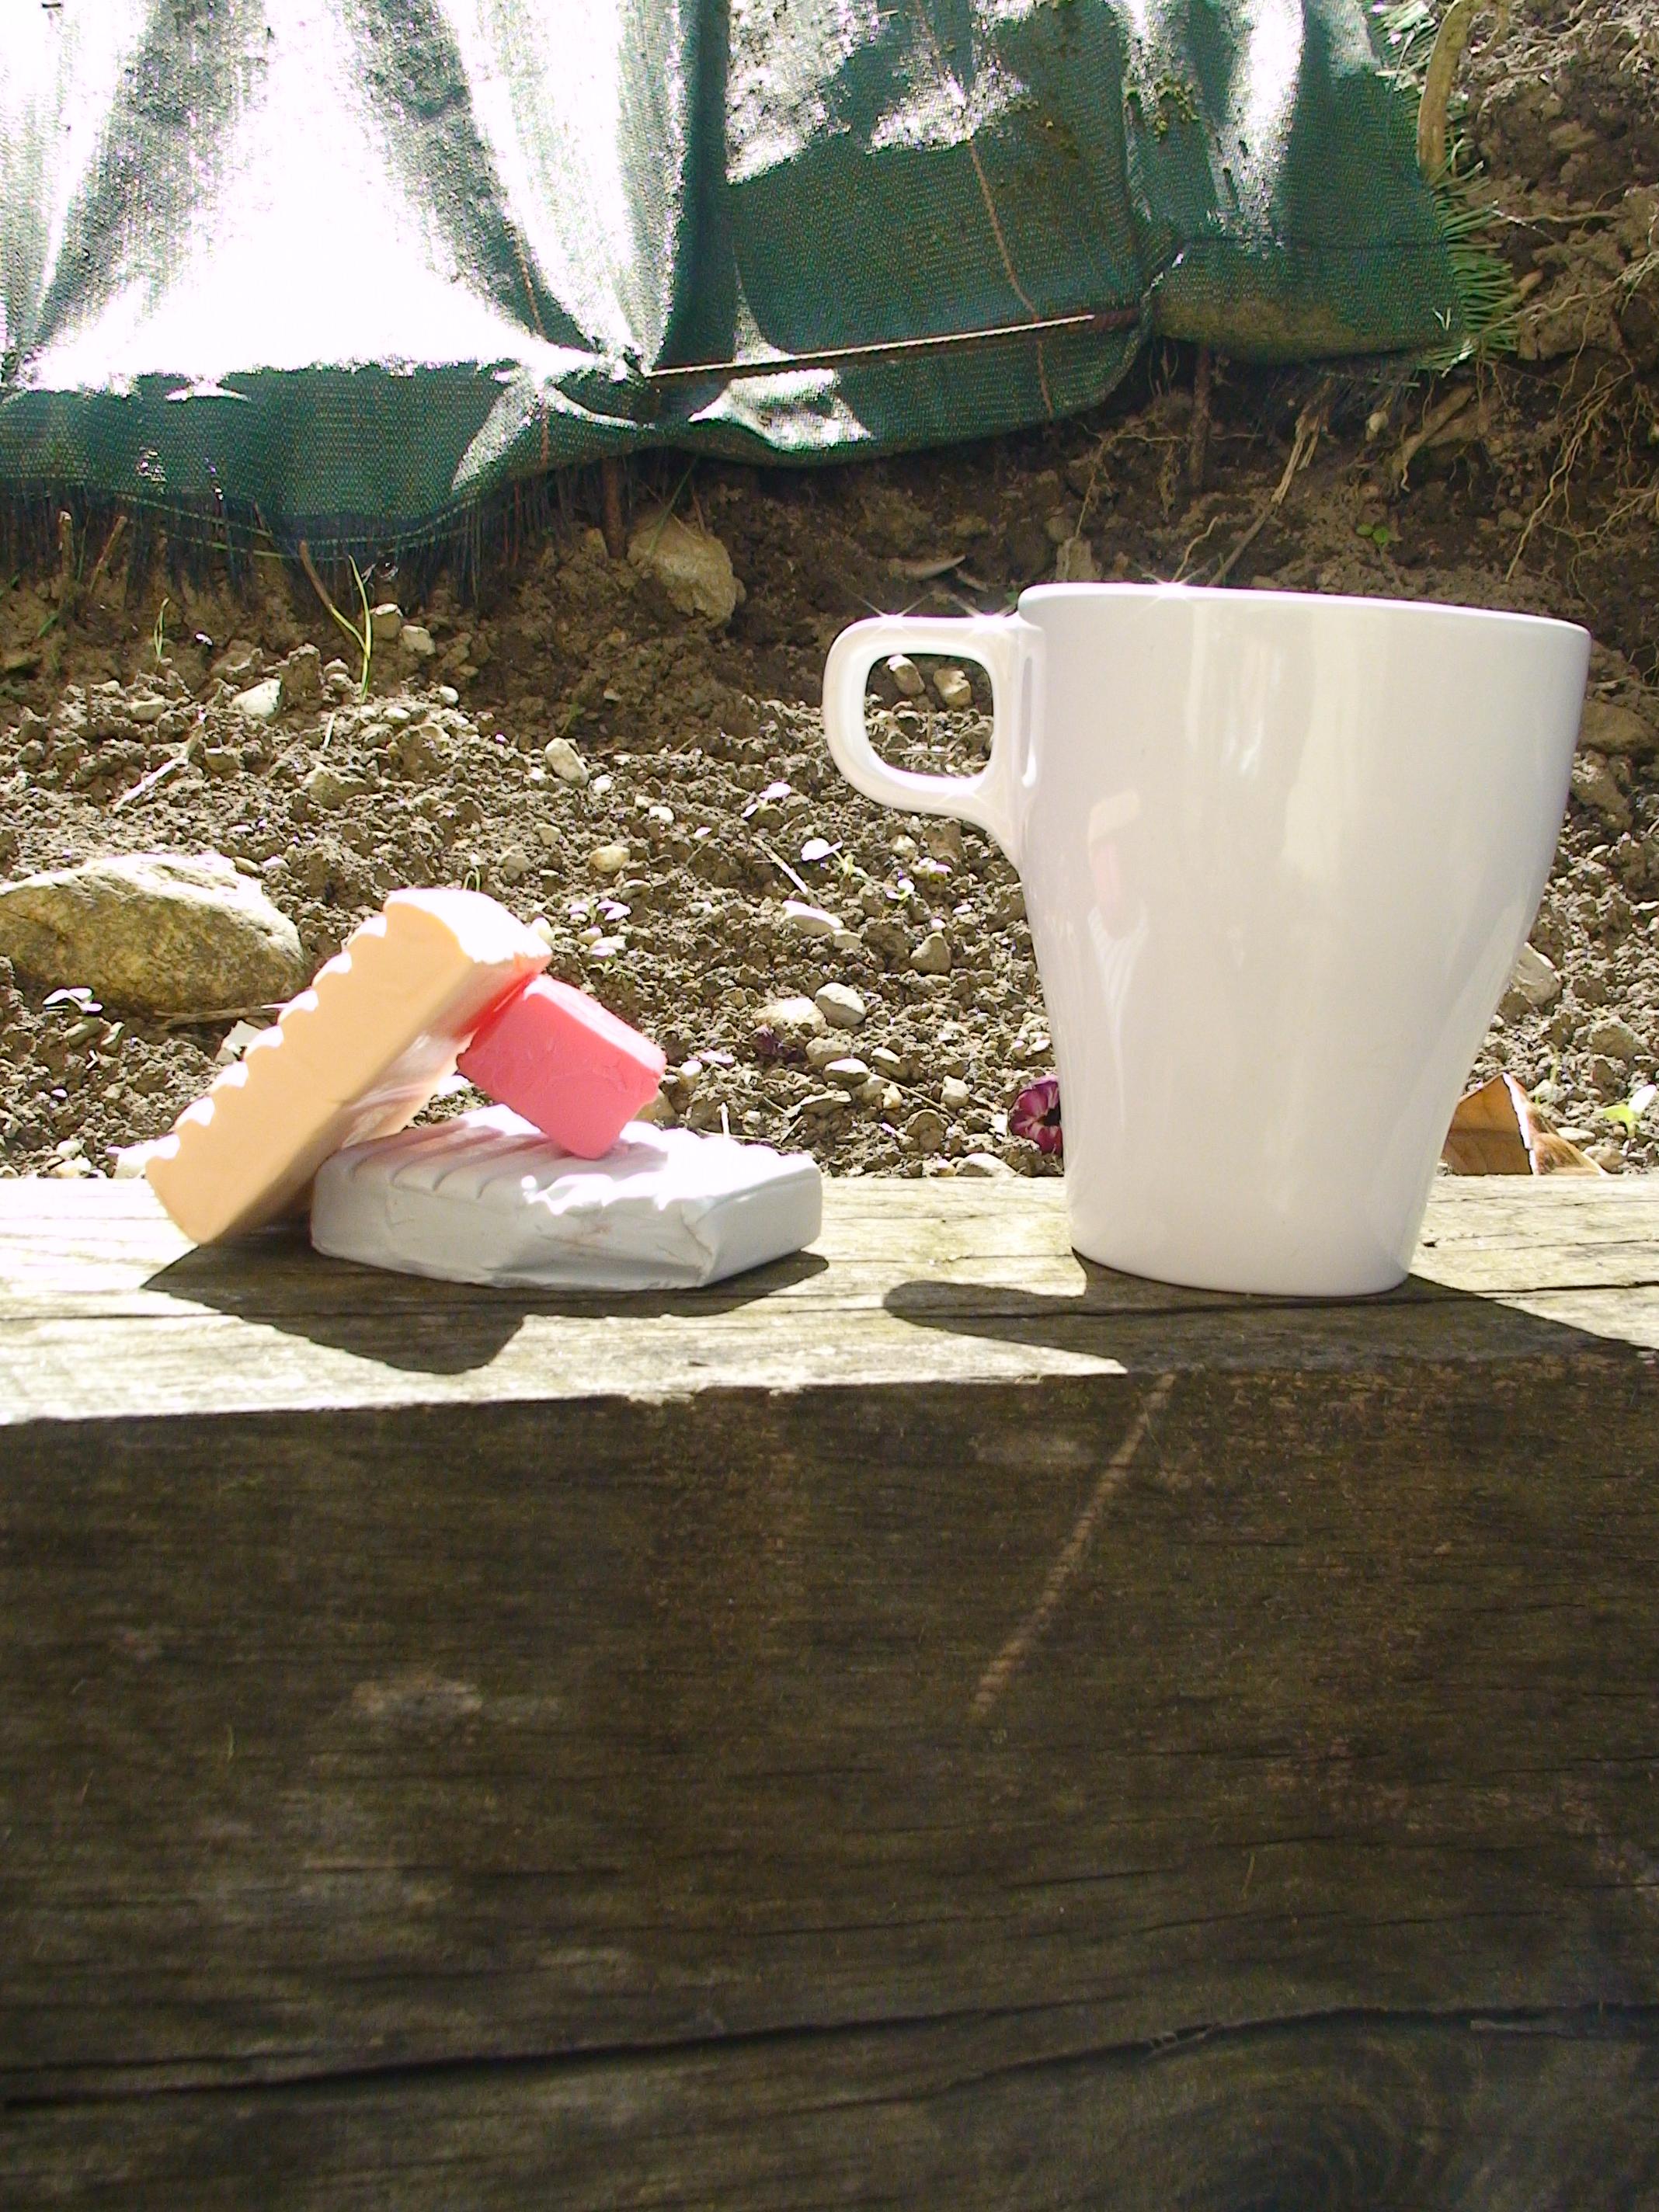 diy personnaliser son mug les potins de lilou. Black Bedroom Furniture Sets. Home Design Ideas